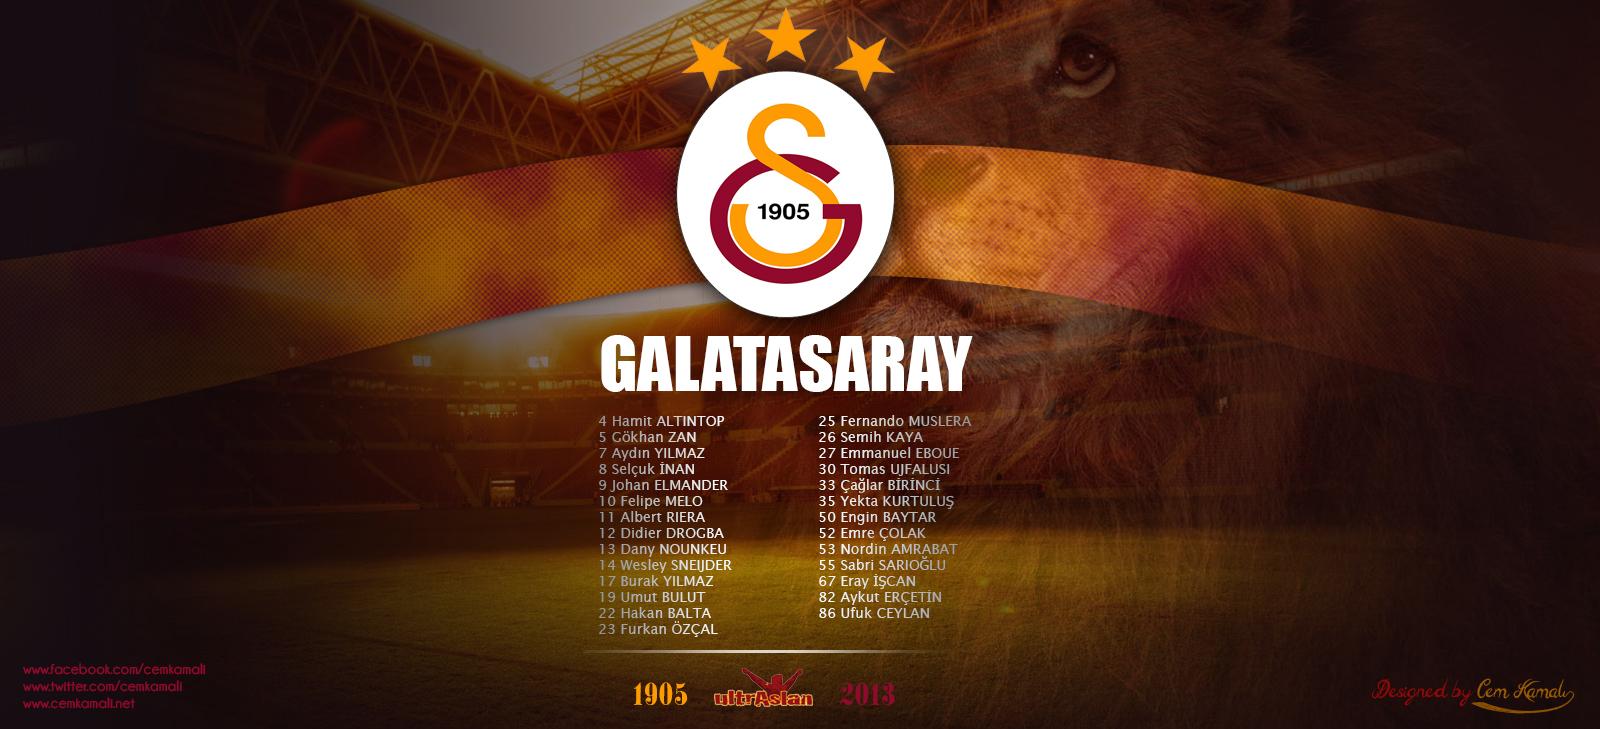 Galatasaray2013[CemKamali]